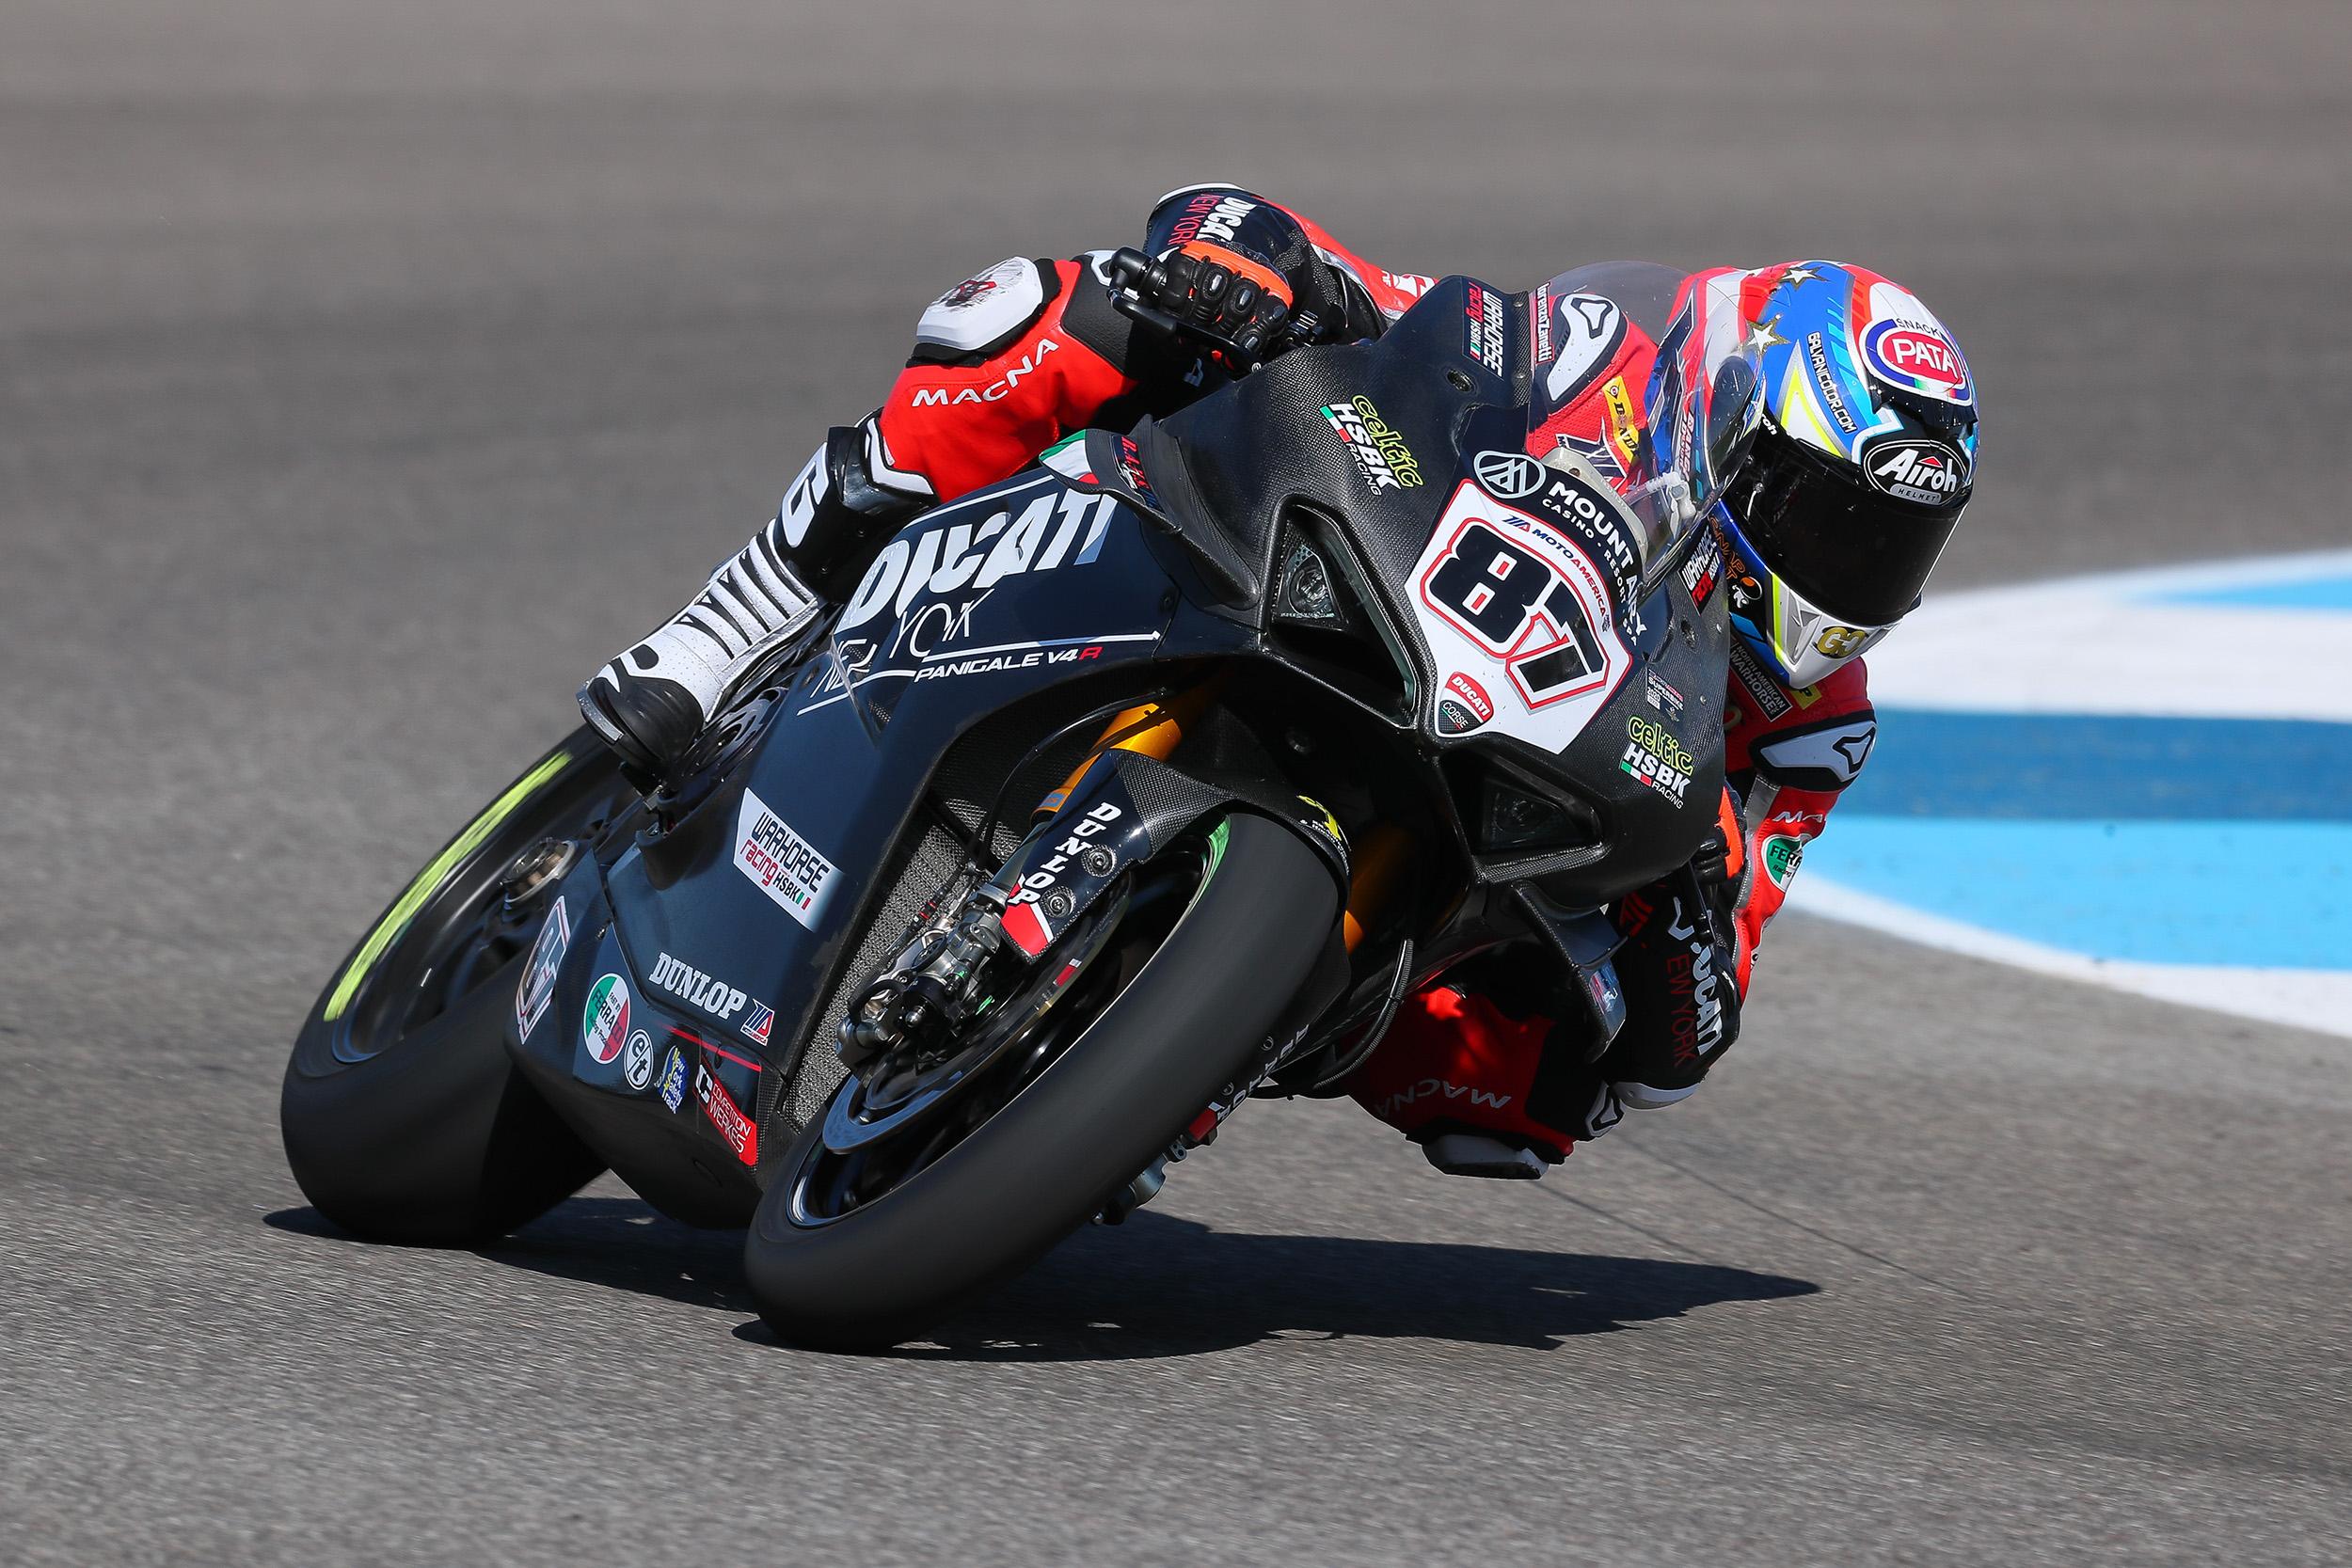 201021 MotoAmerica - Superbike – Lorenzo Zanetti #87